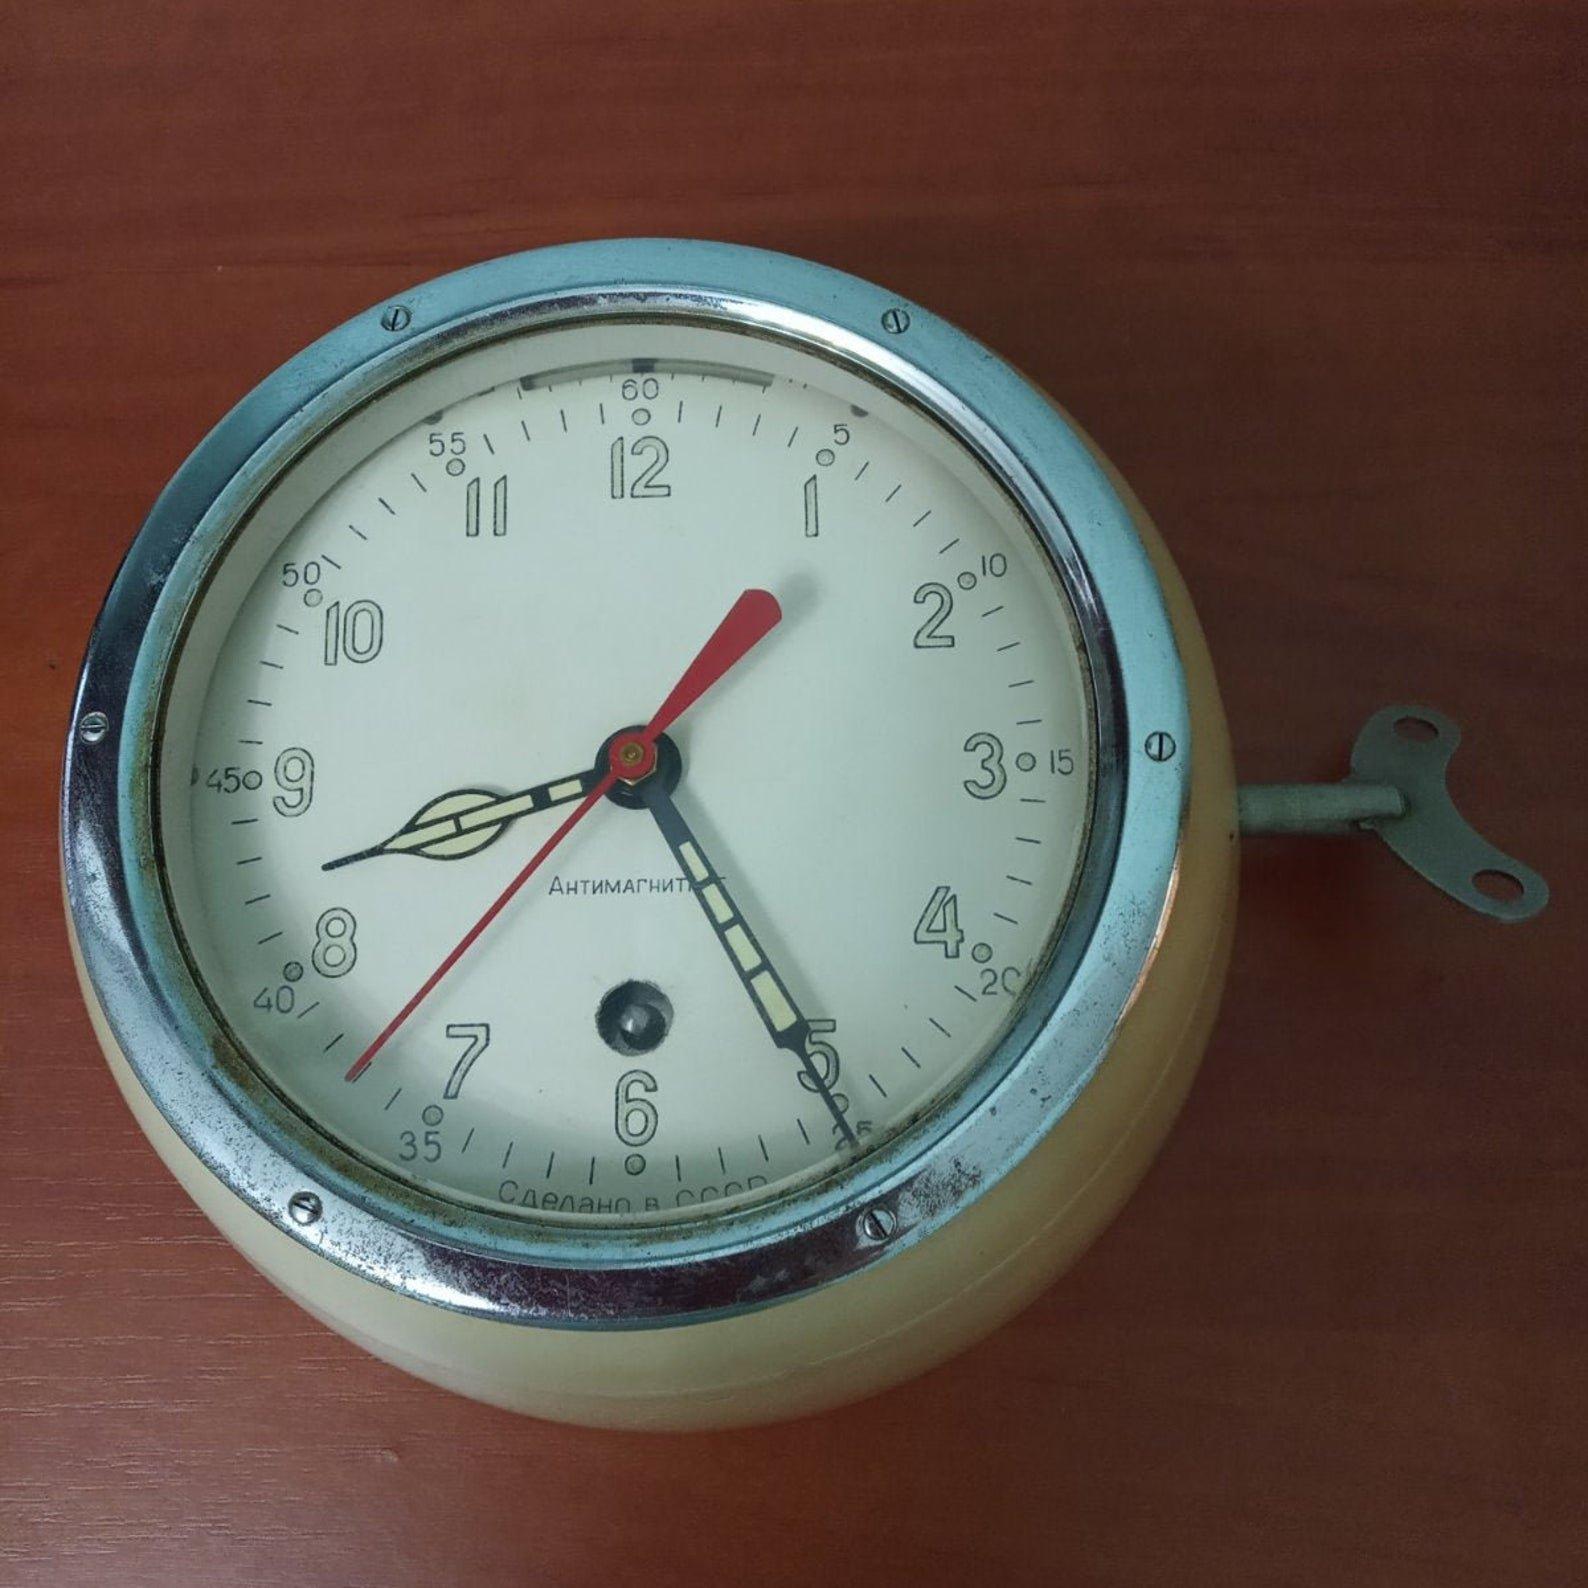 Horloge de marine Vostok - Page 2 210530075319993962